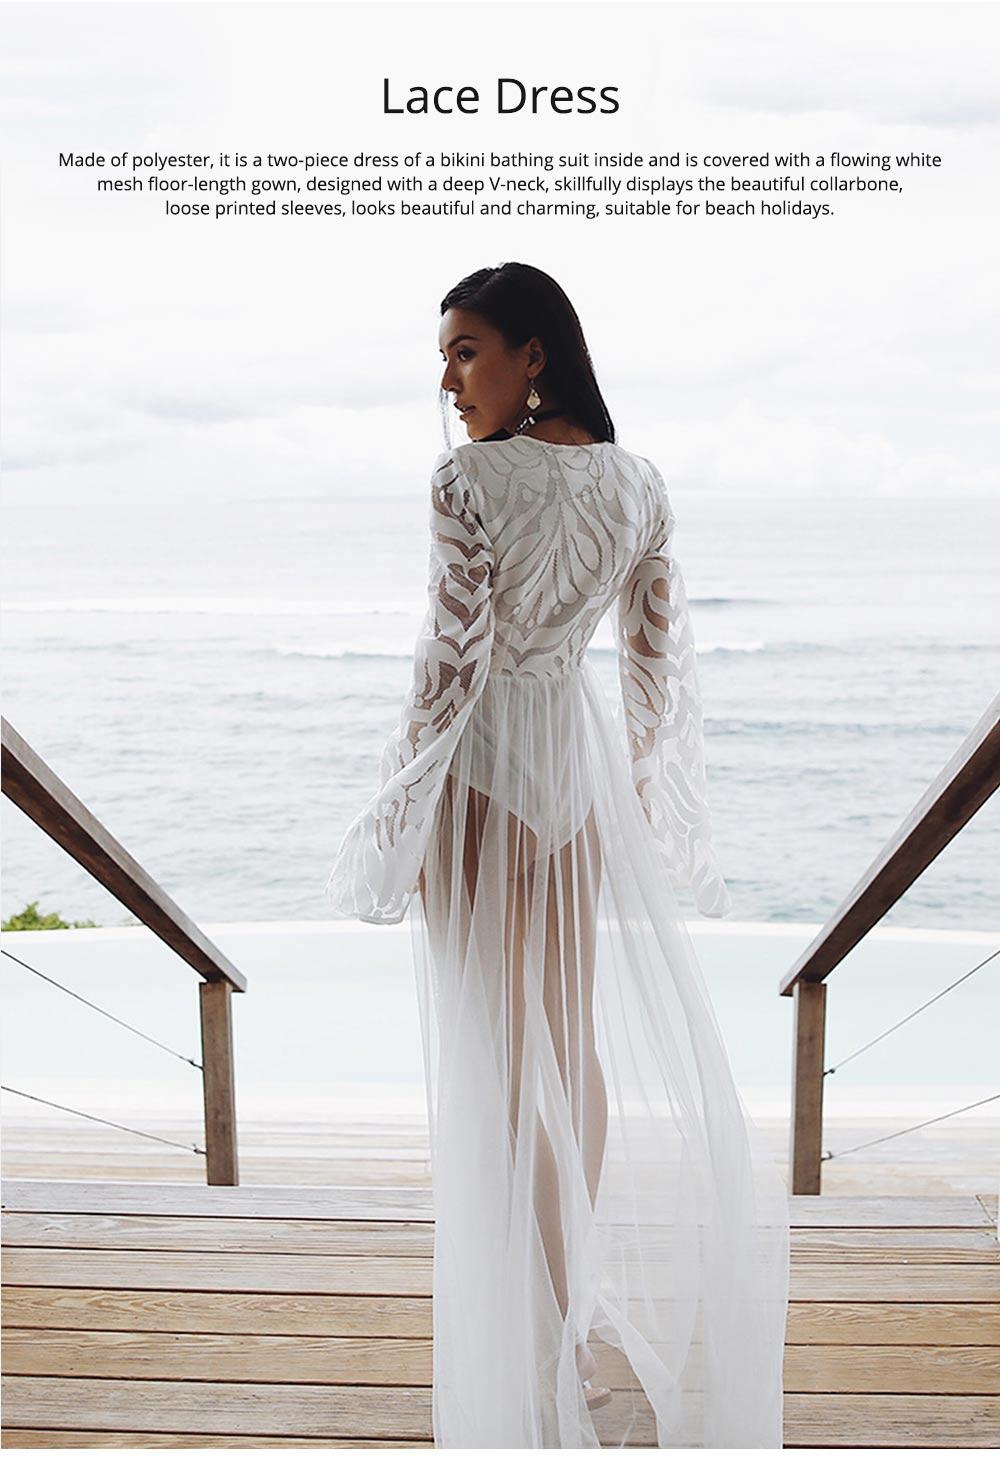 Women Lace Mesh Dress for Beach Holiday, Stylish White Floor-length Fashion Bikini Swimwear Two-piece Dress Skirt 0